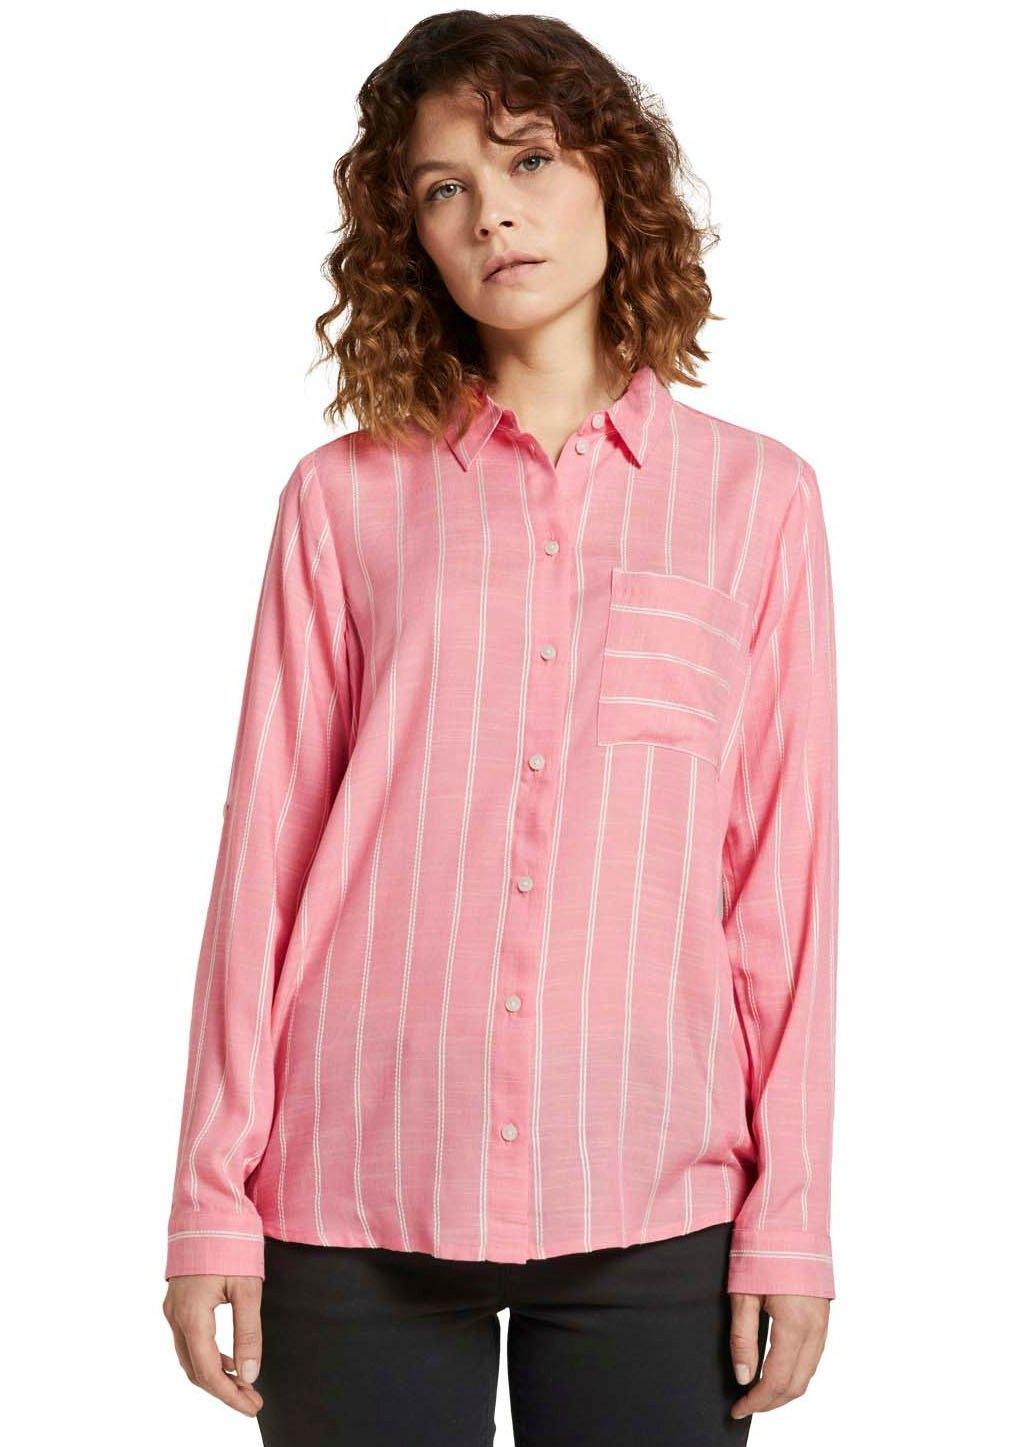 Tom Tailor overhemdblouse online kopen op otto.nl